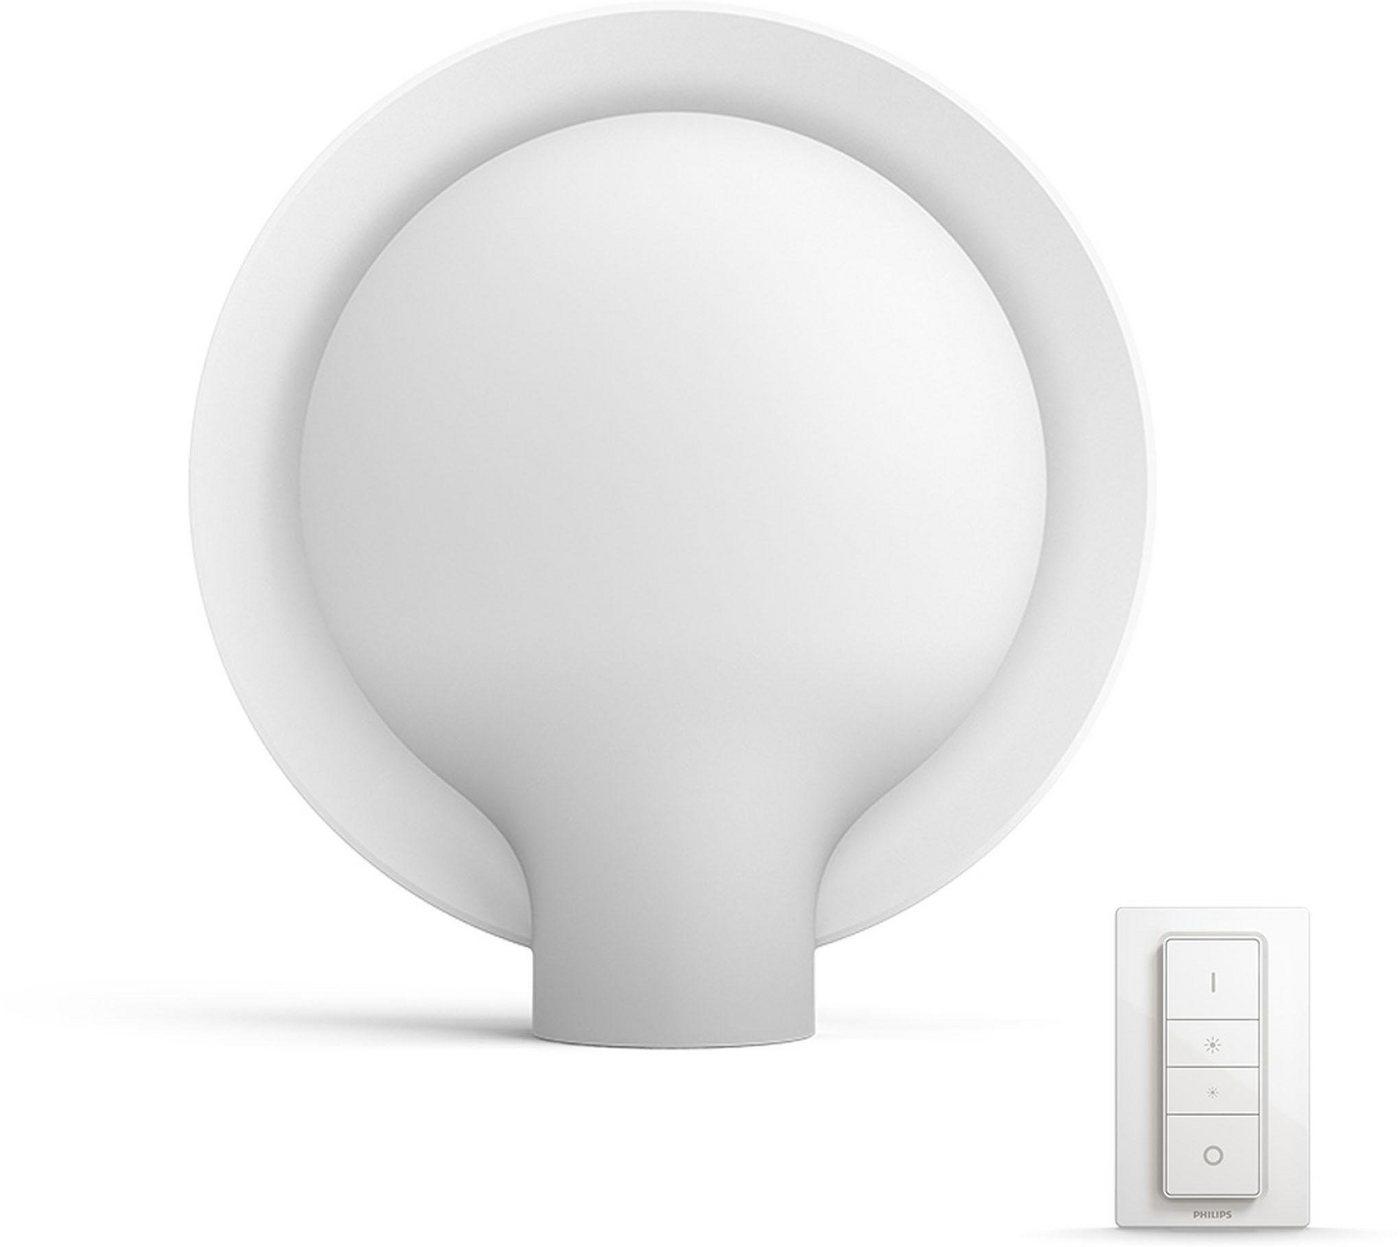 "LED Tischleuchte ""Felicity"", Energieeffizienzklasse: A+, Philips Hue"